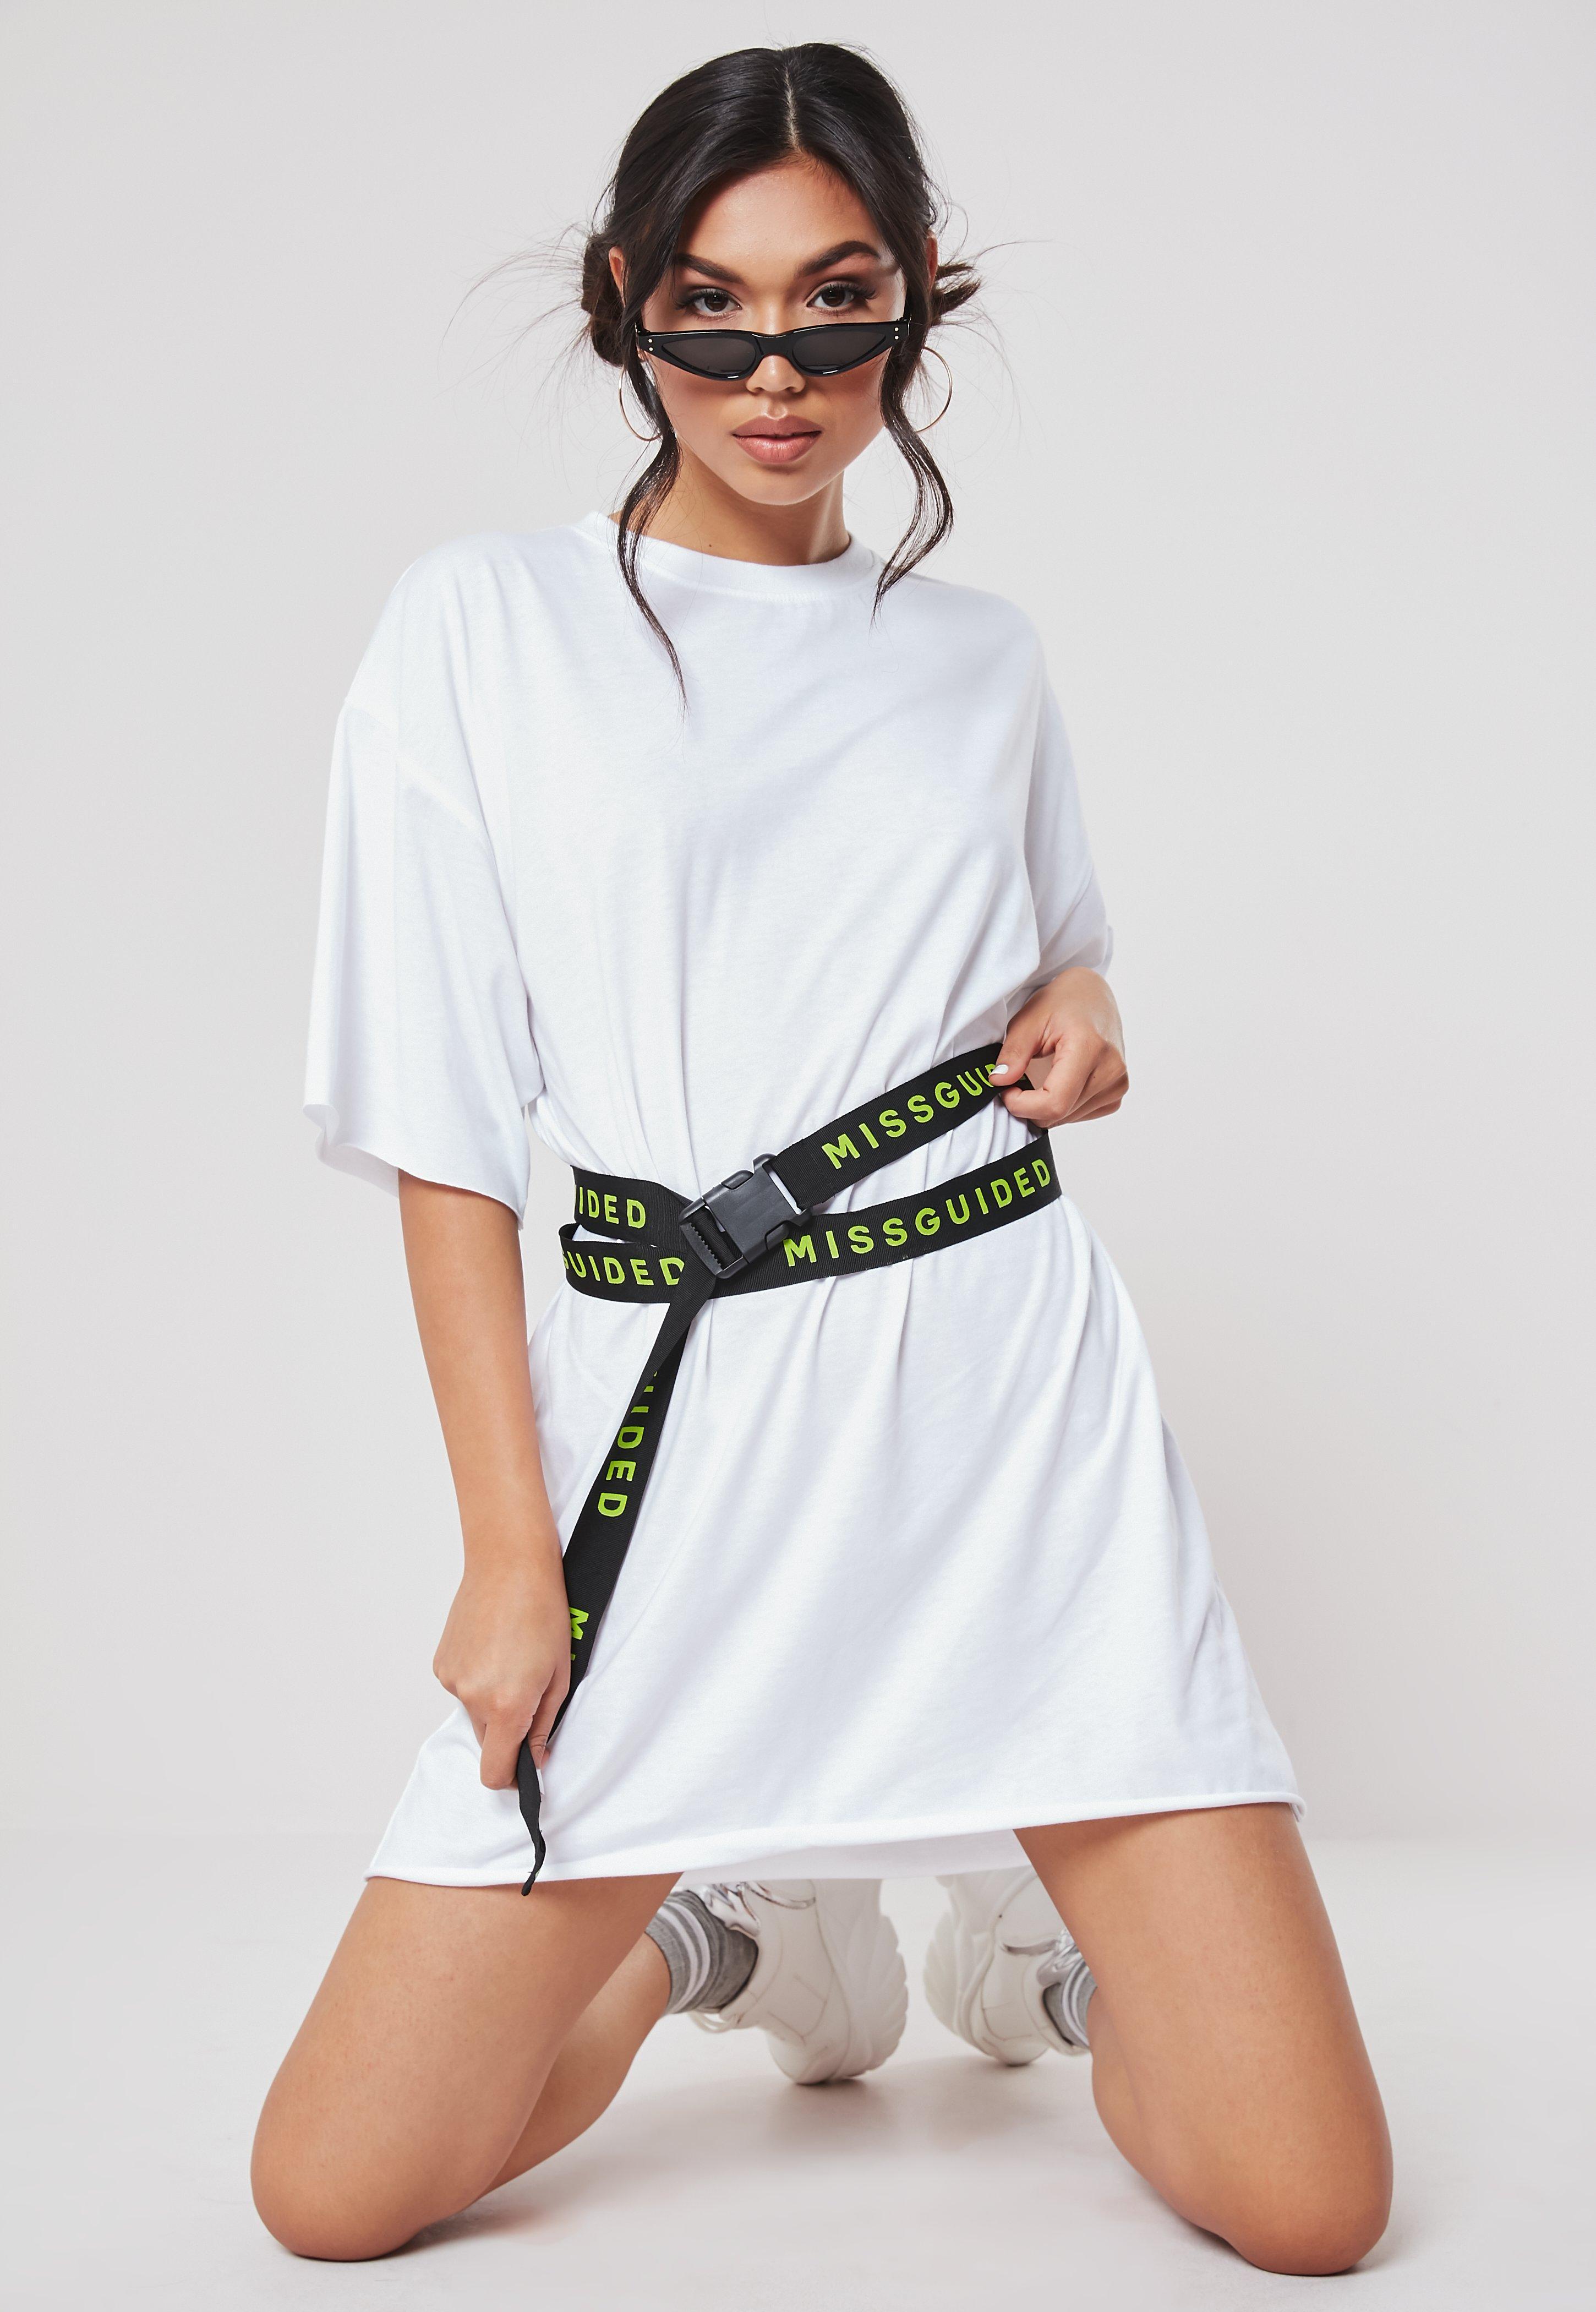 b0aee3a2e6c Dresses UK